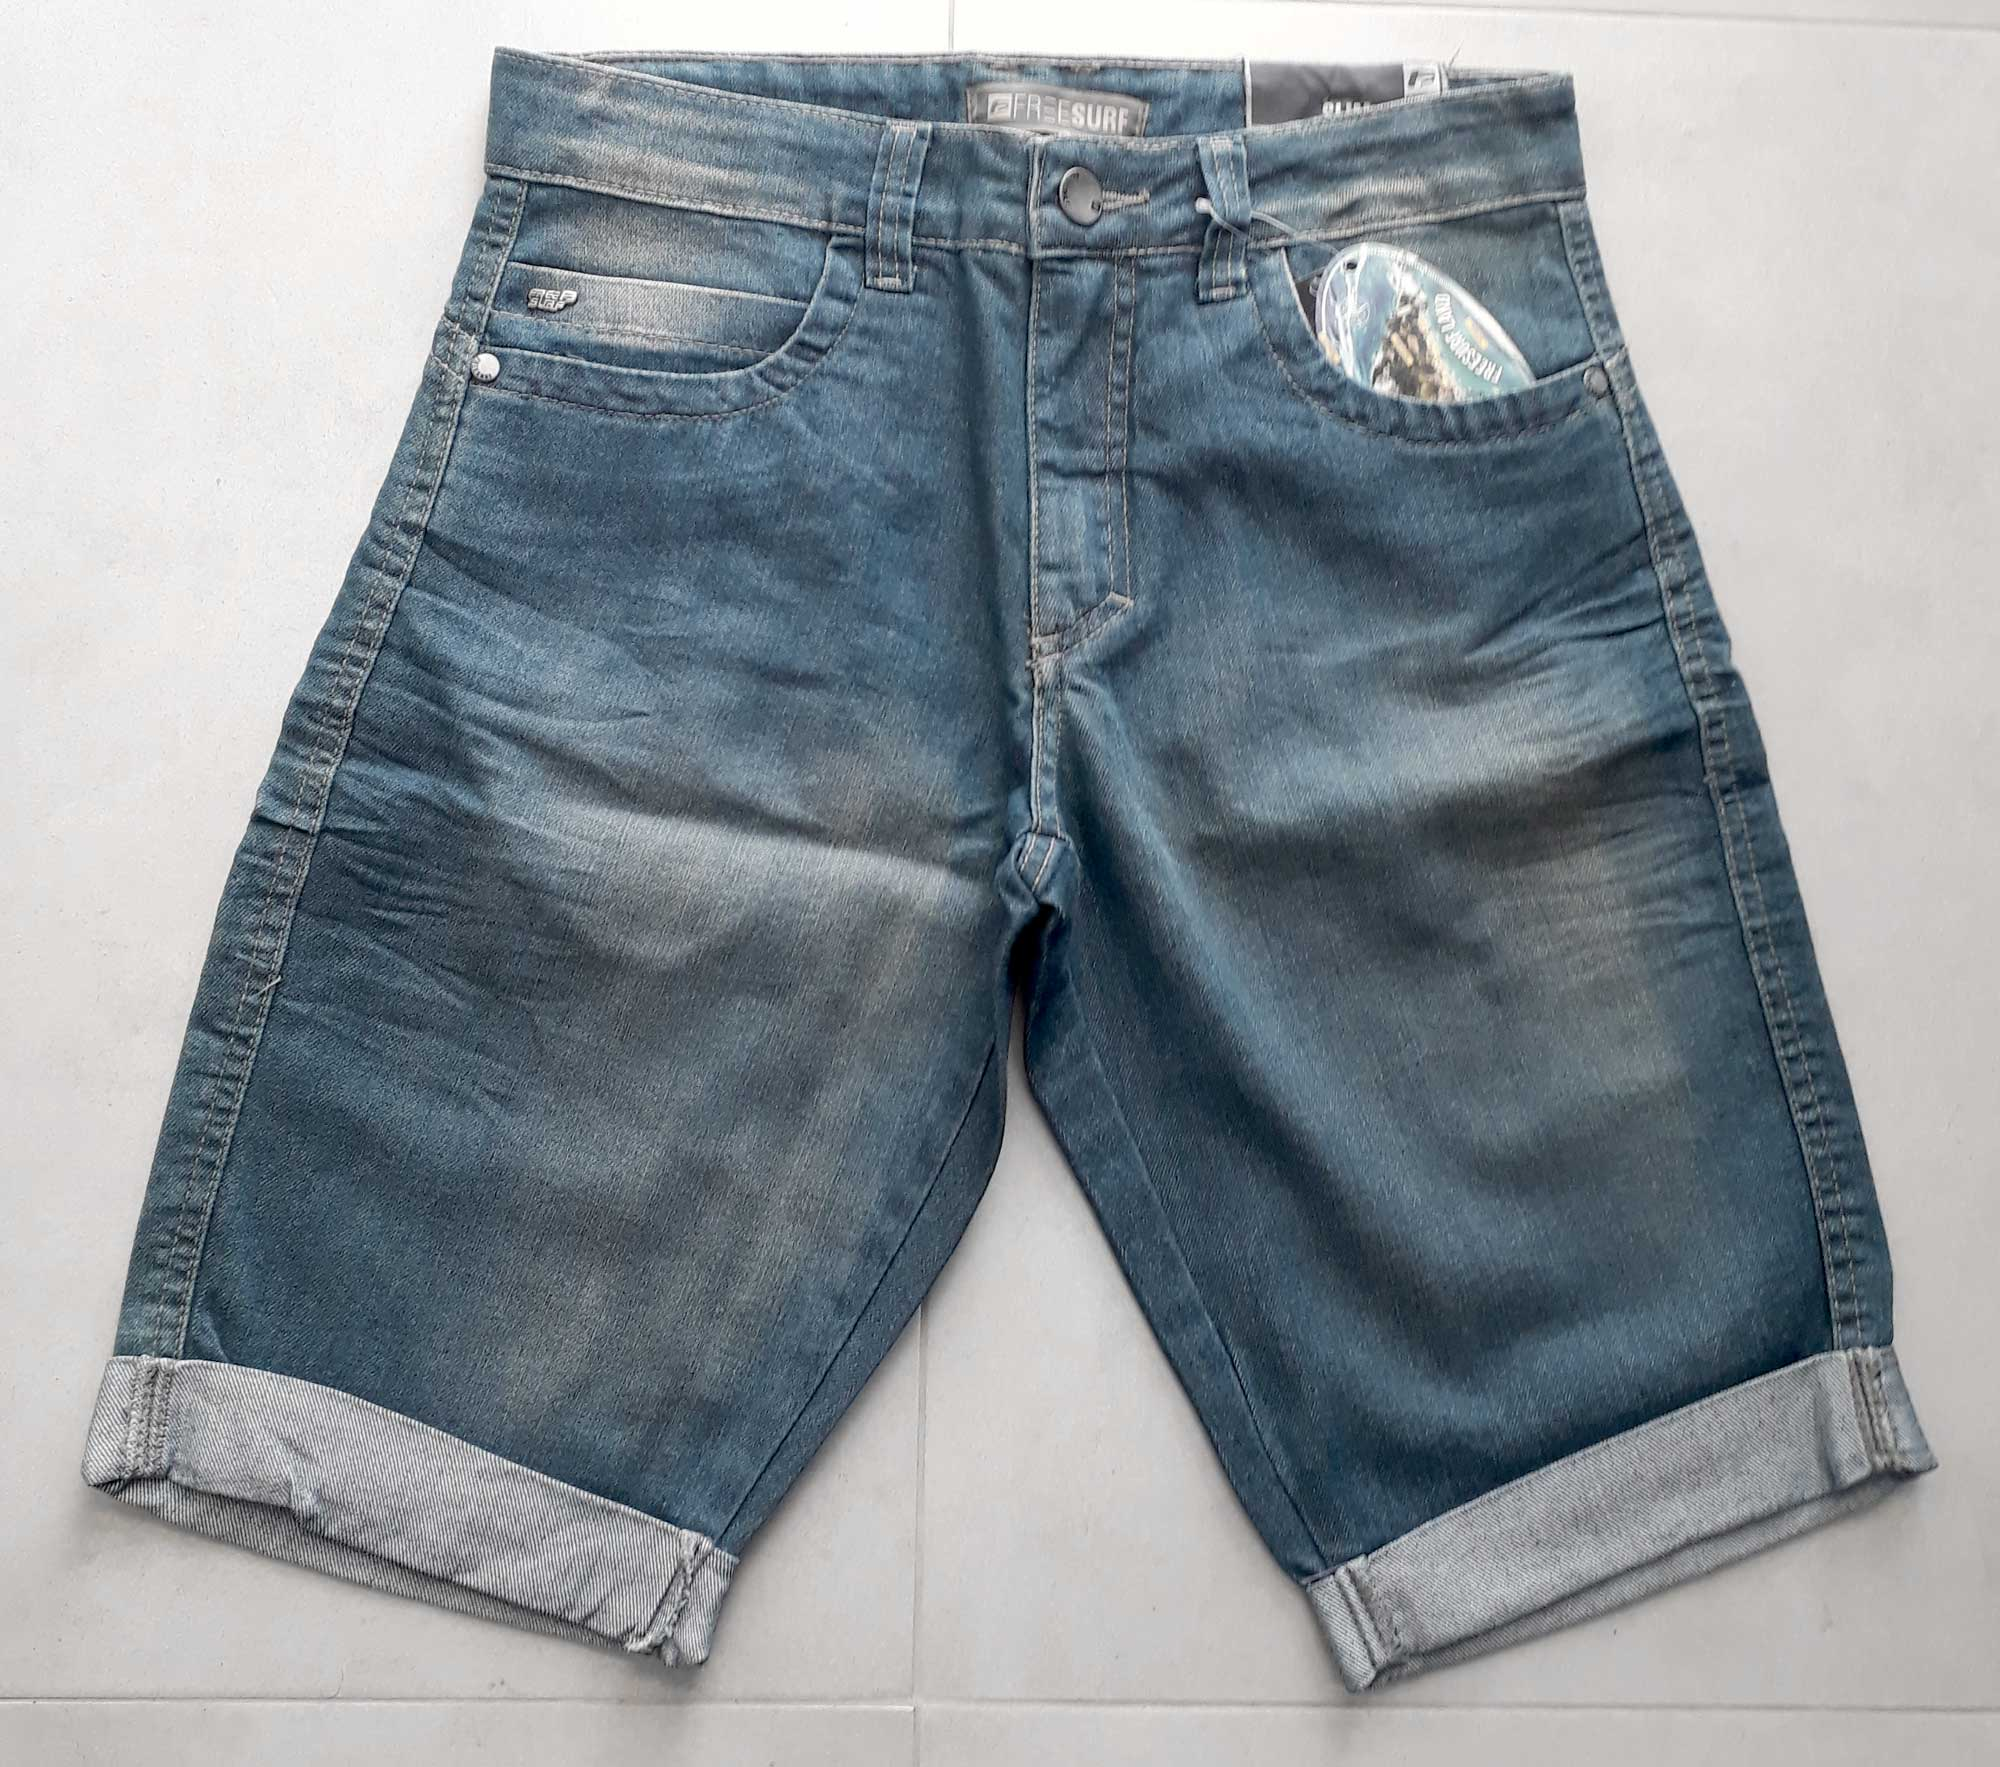 Bermuda Jeans Freesurf Paddang - 36, 40, 42